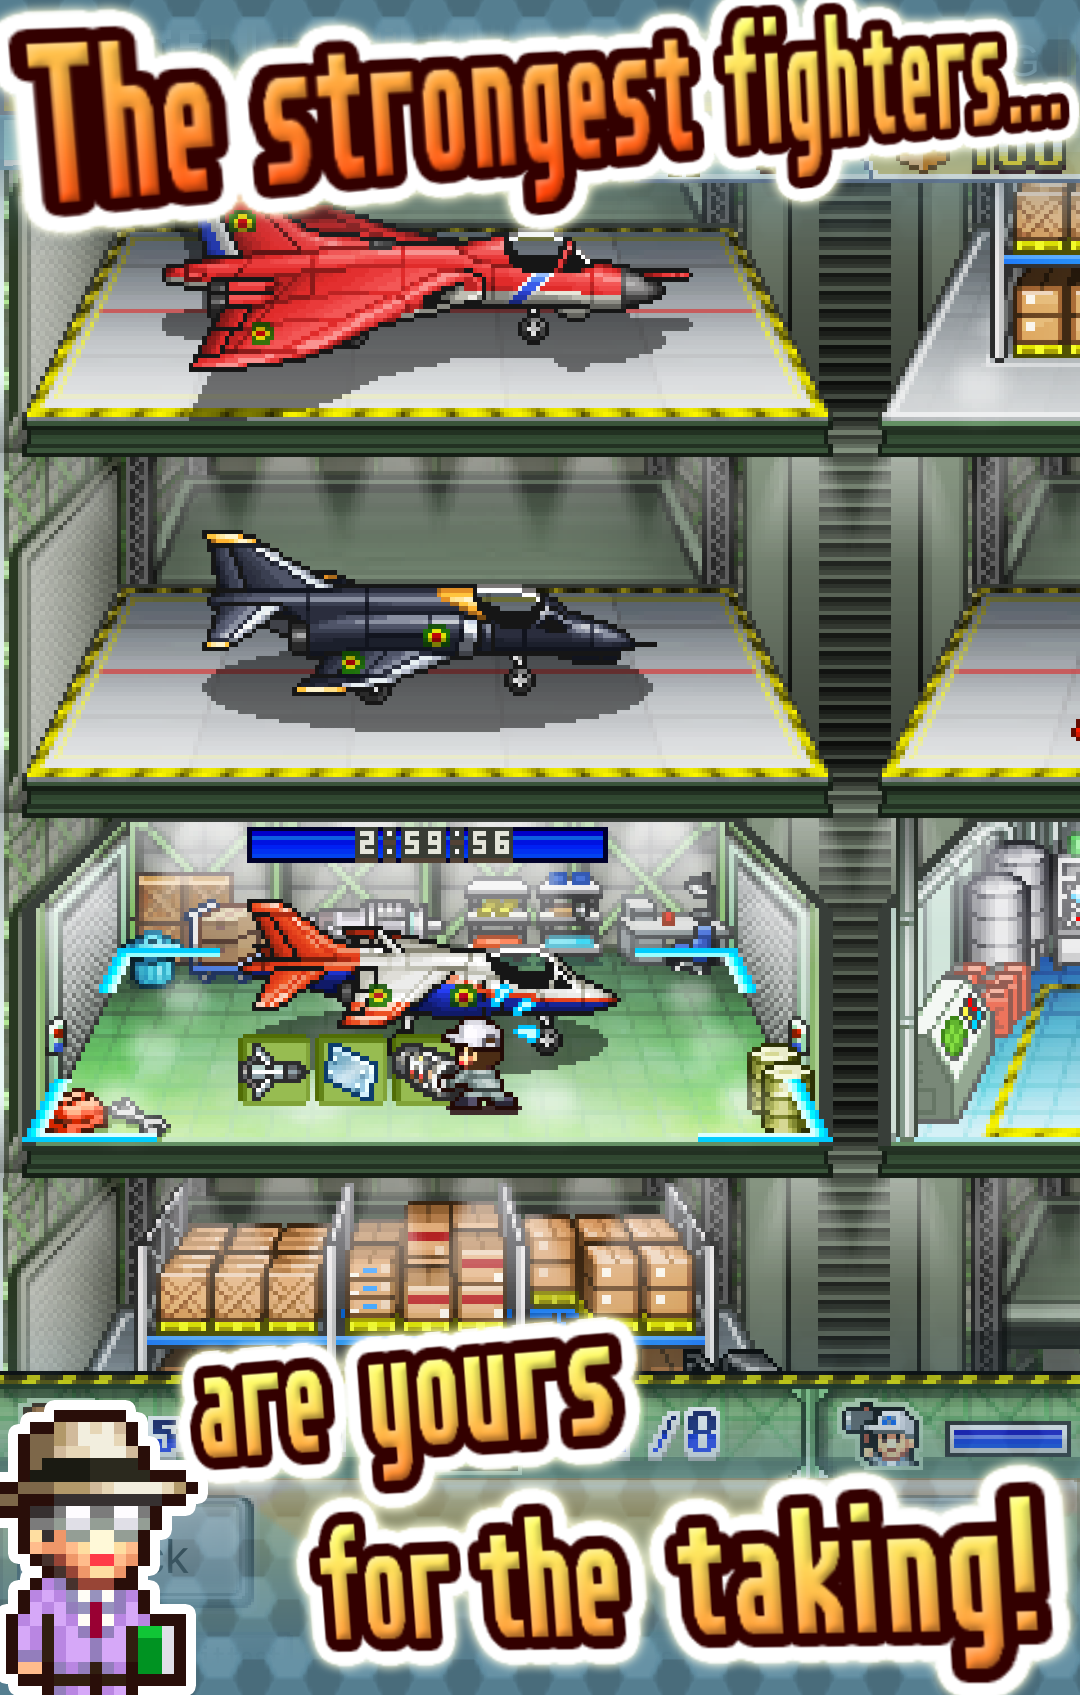 Skyforce Unite! screenshot #10